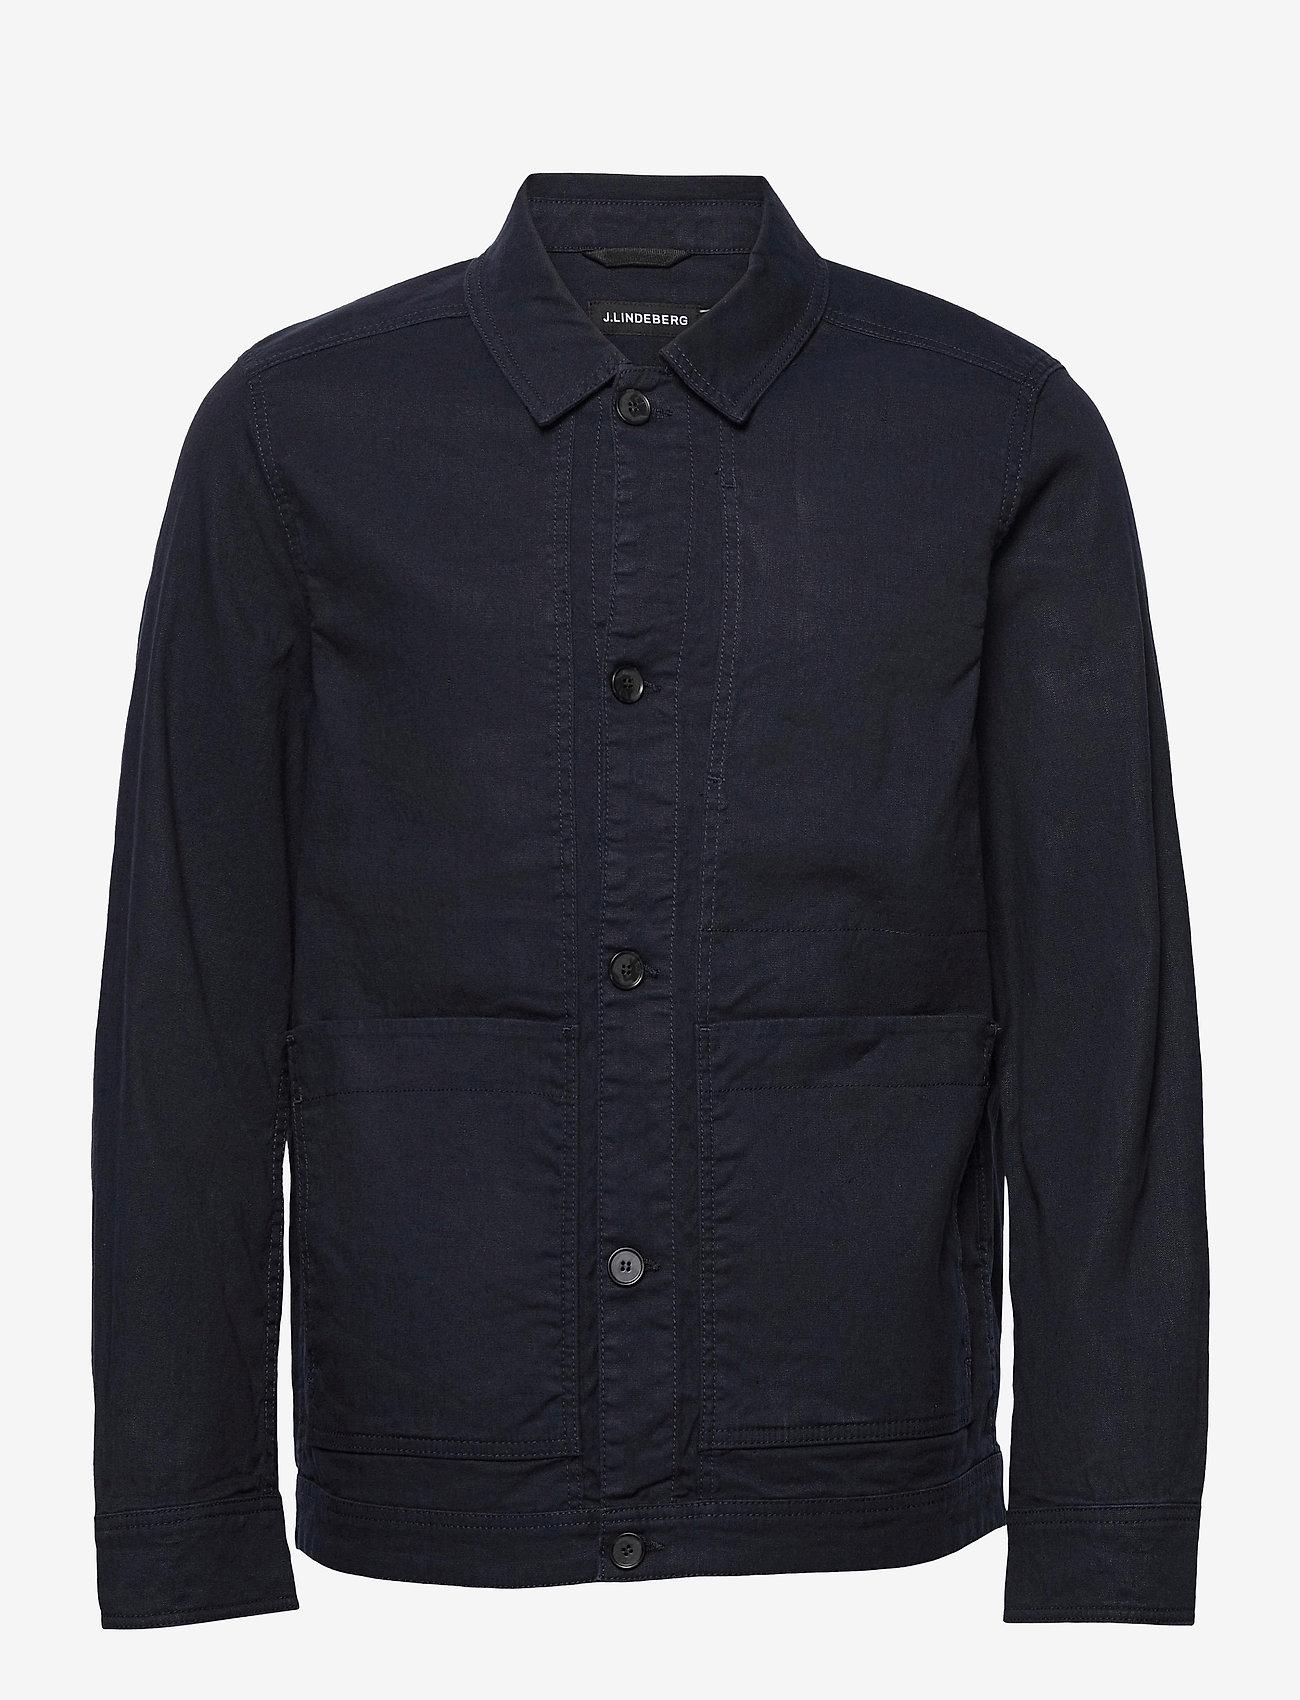 J. Lindeberg - Eric Cotton Linen Jacket - oberteile - jl navy - 1